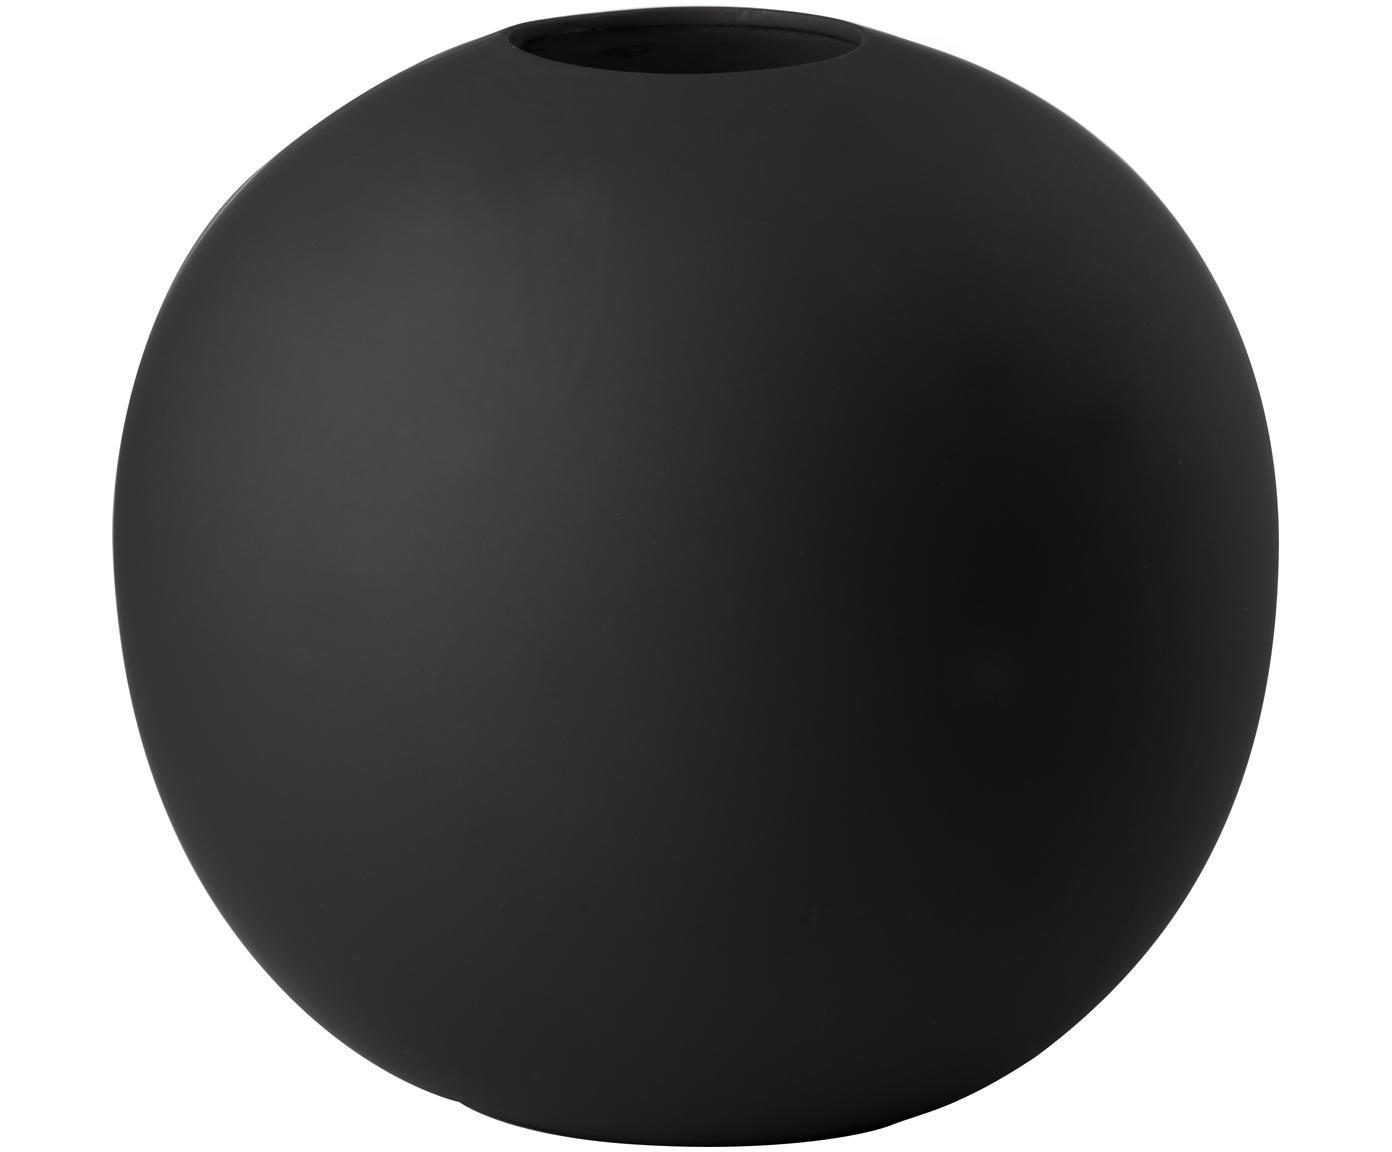 Vaas Ball, Keramiek, Zwart, Ø 20 x H 20 cm